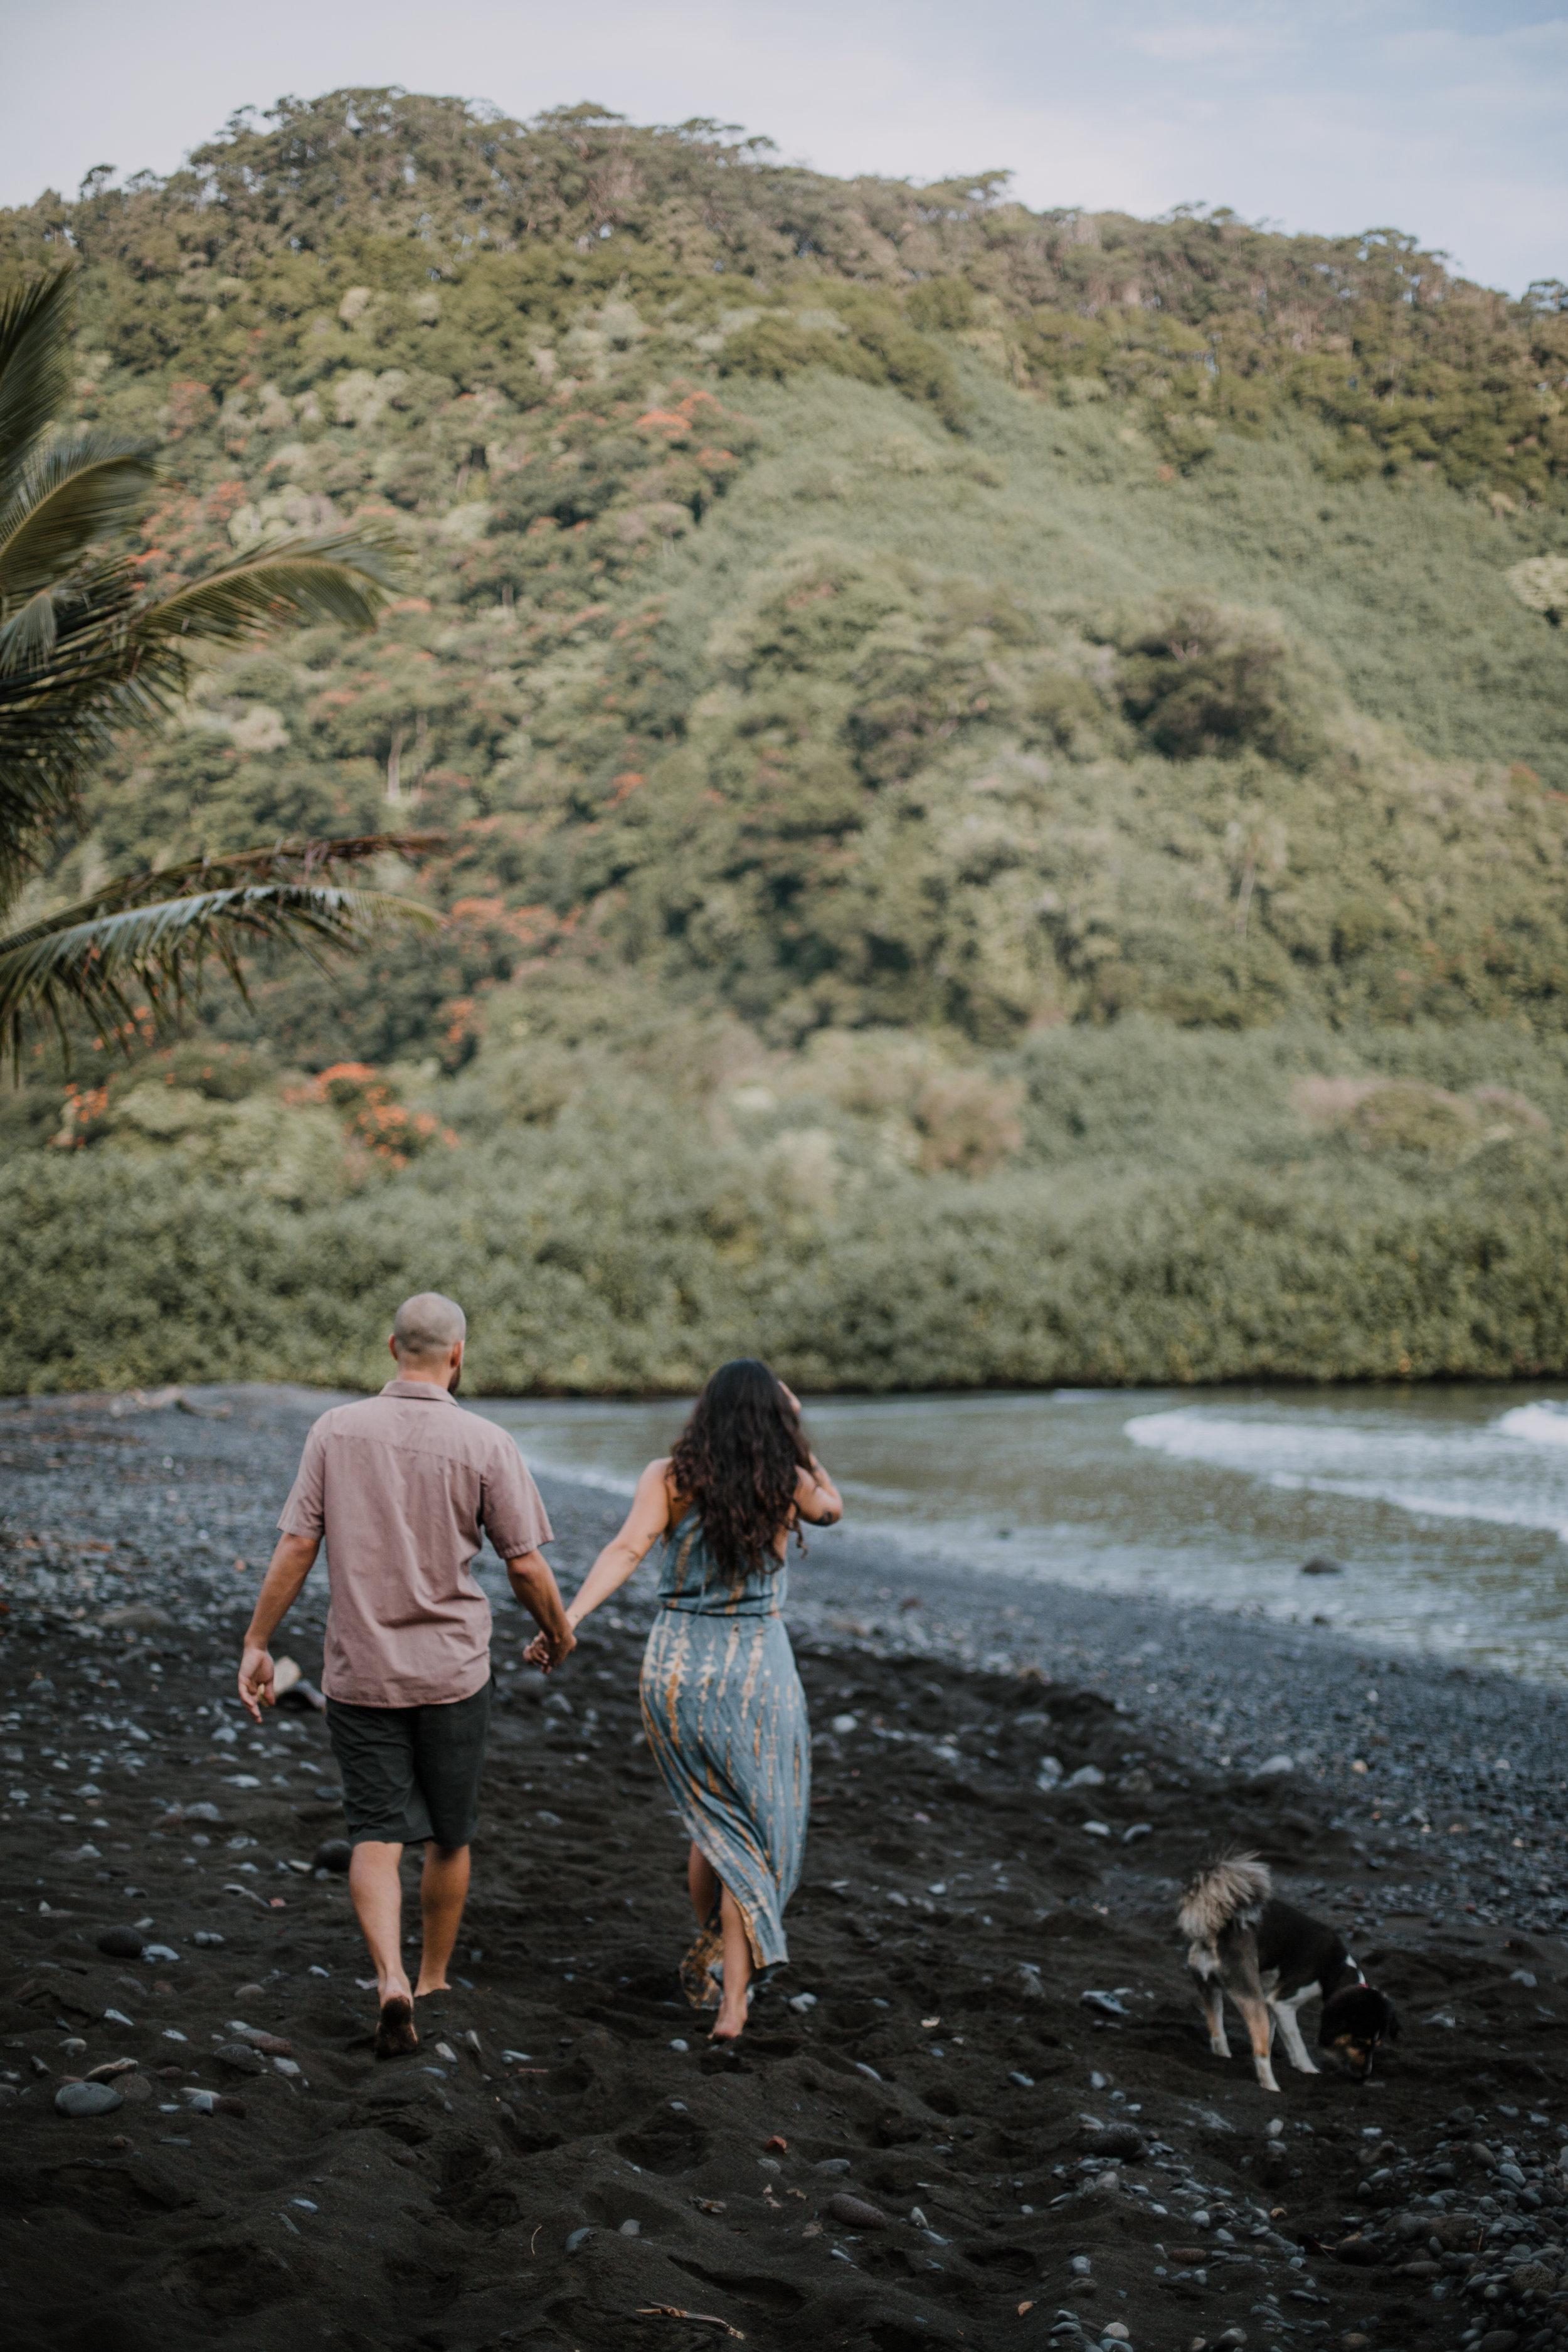 maui black beach engagement, island hiking, hawaii waterfall, road to hana, maui waterfall, hawaii wedding photographer, hawaii elopement photographer, maui wedding, maui engagements, maui elopement